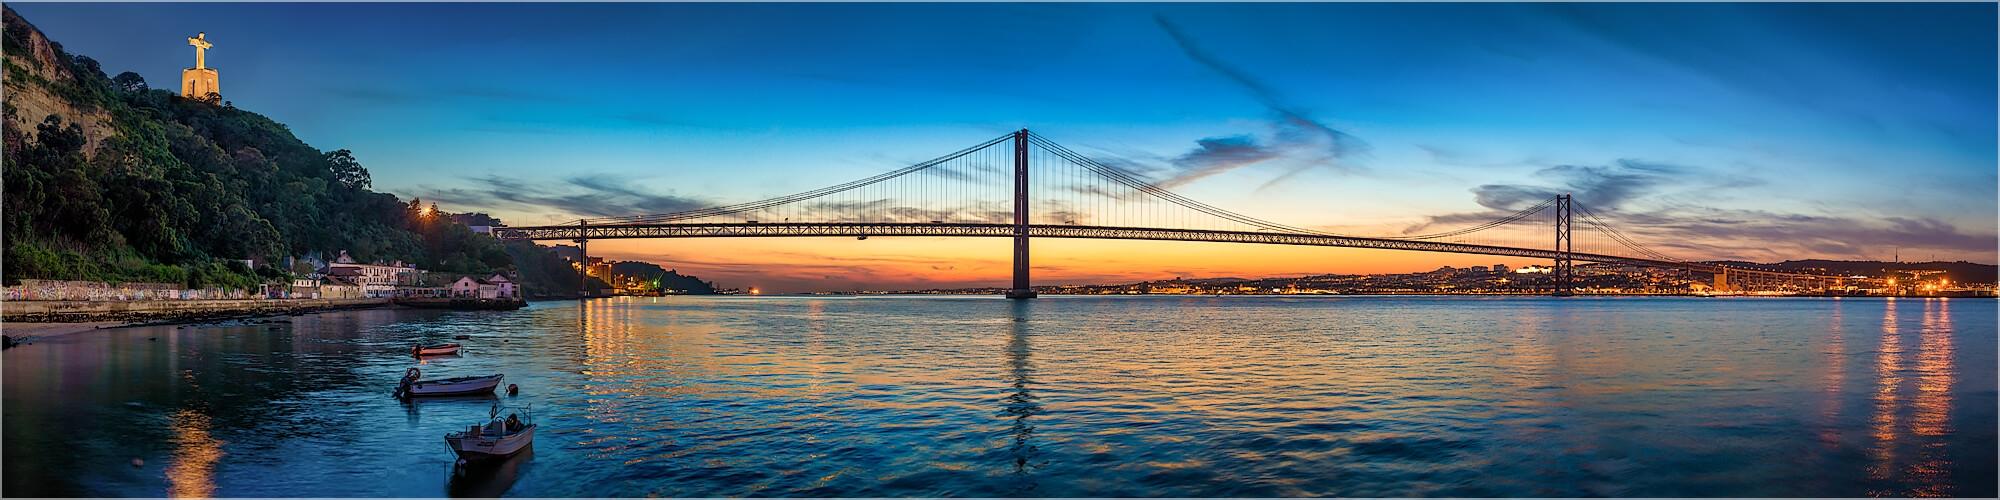 Panoramabild Brücke 25. Abril Lissabon Portugal